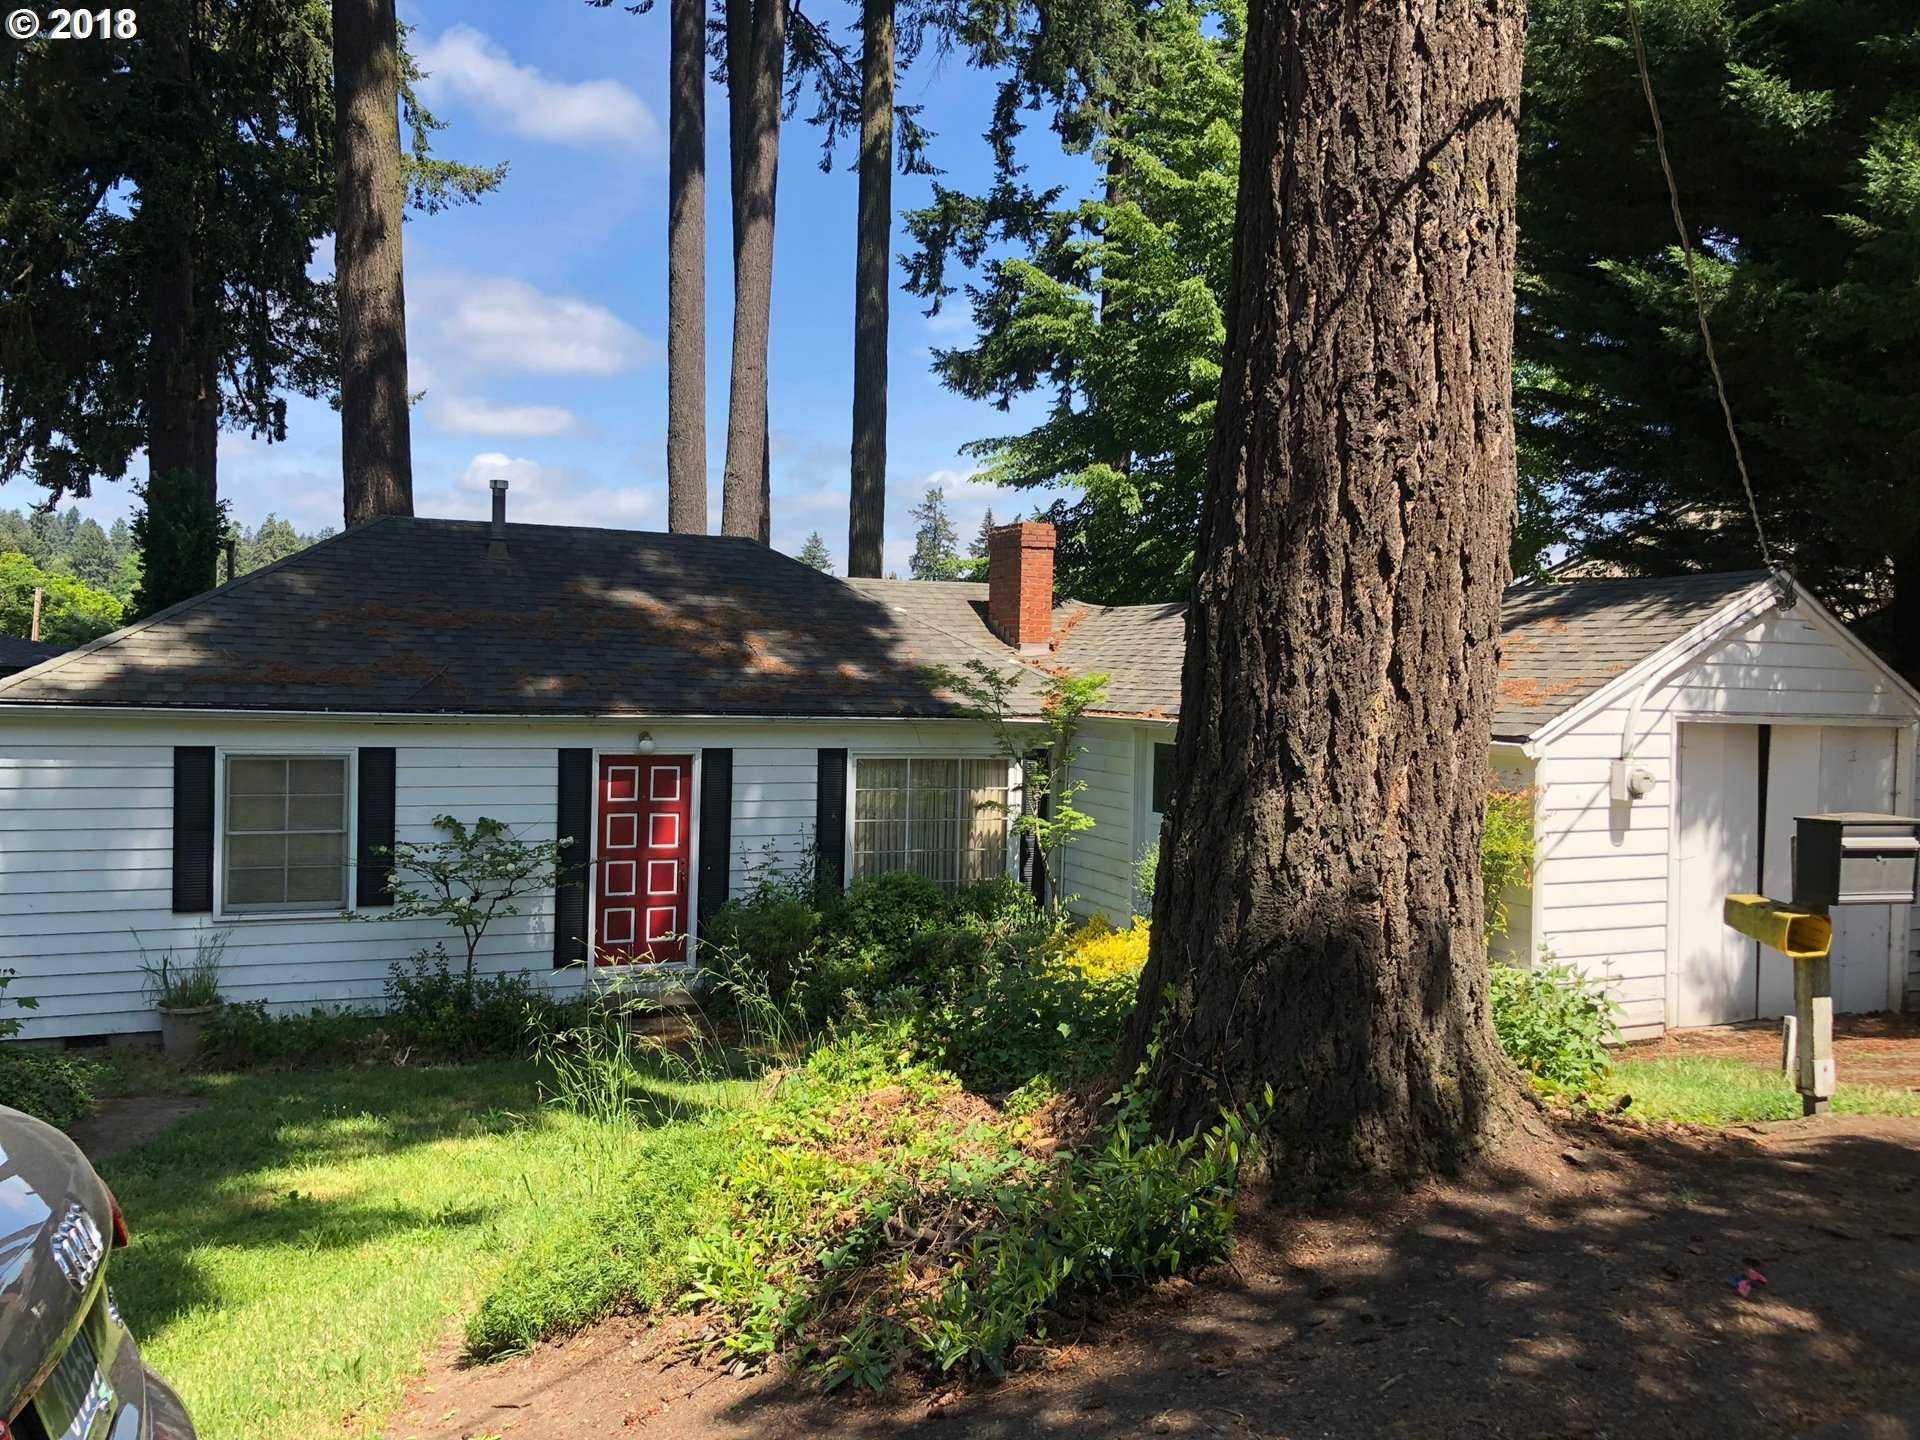 $445,000 - 3Br/1Ba -  for Sale in Lakewood, Lake Oswego